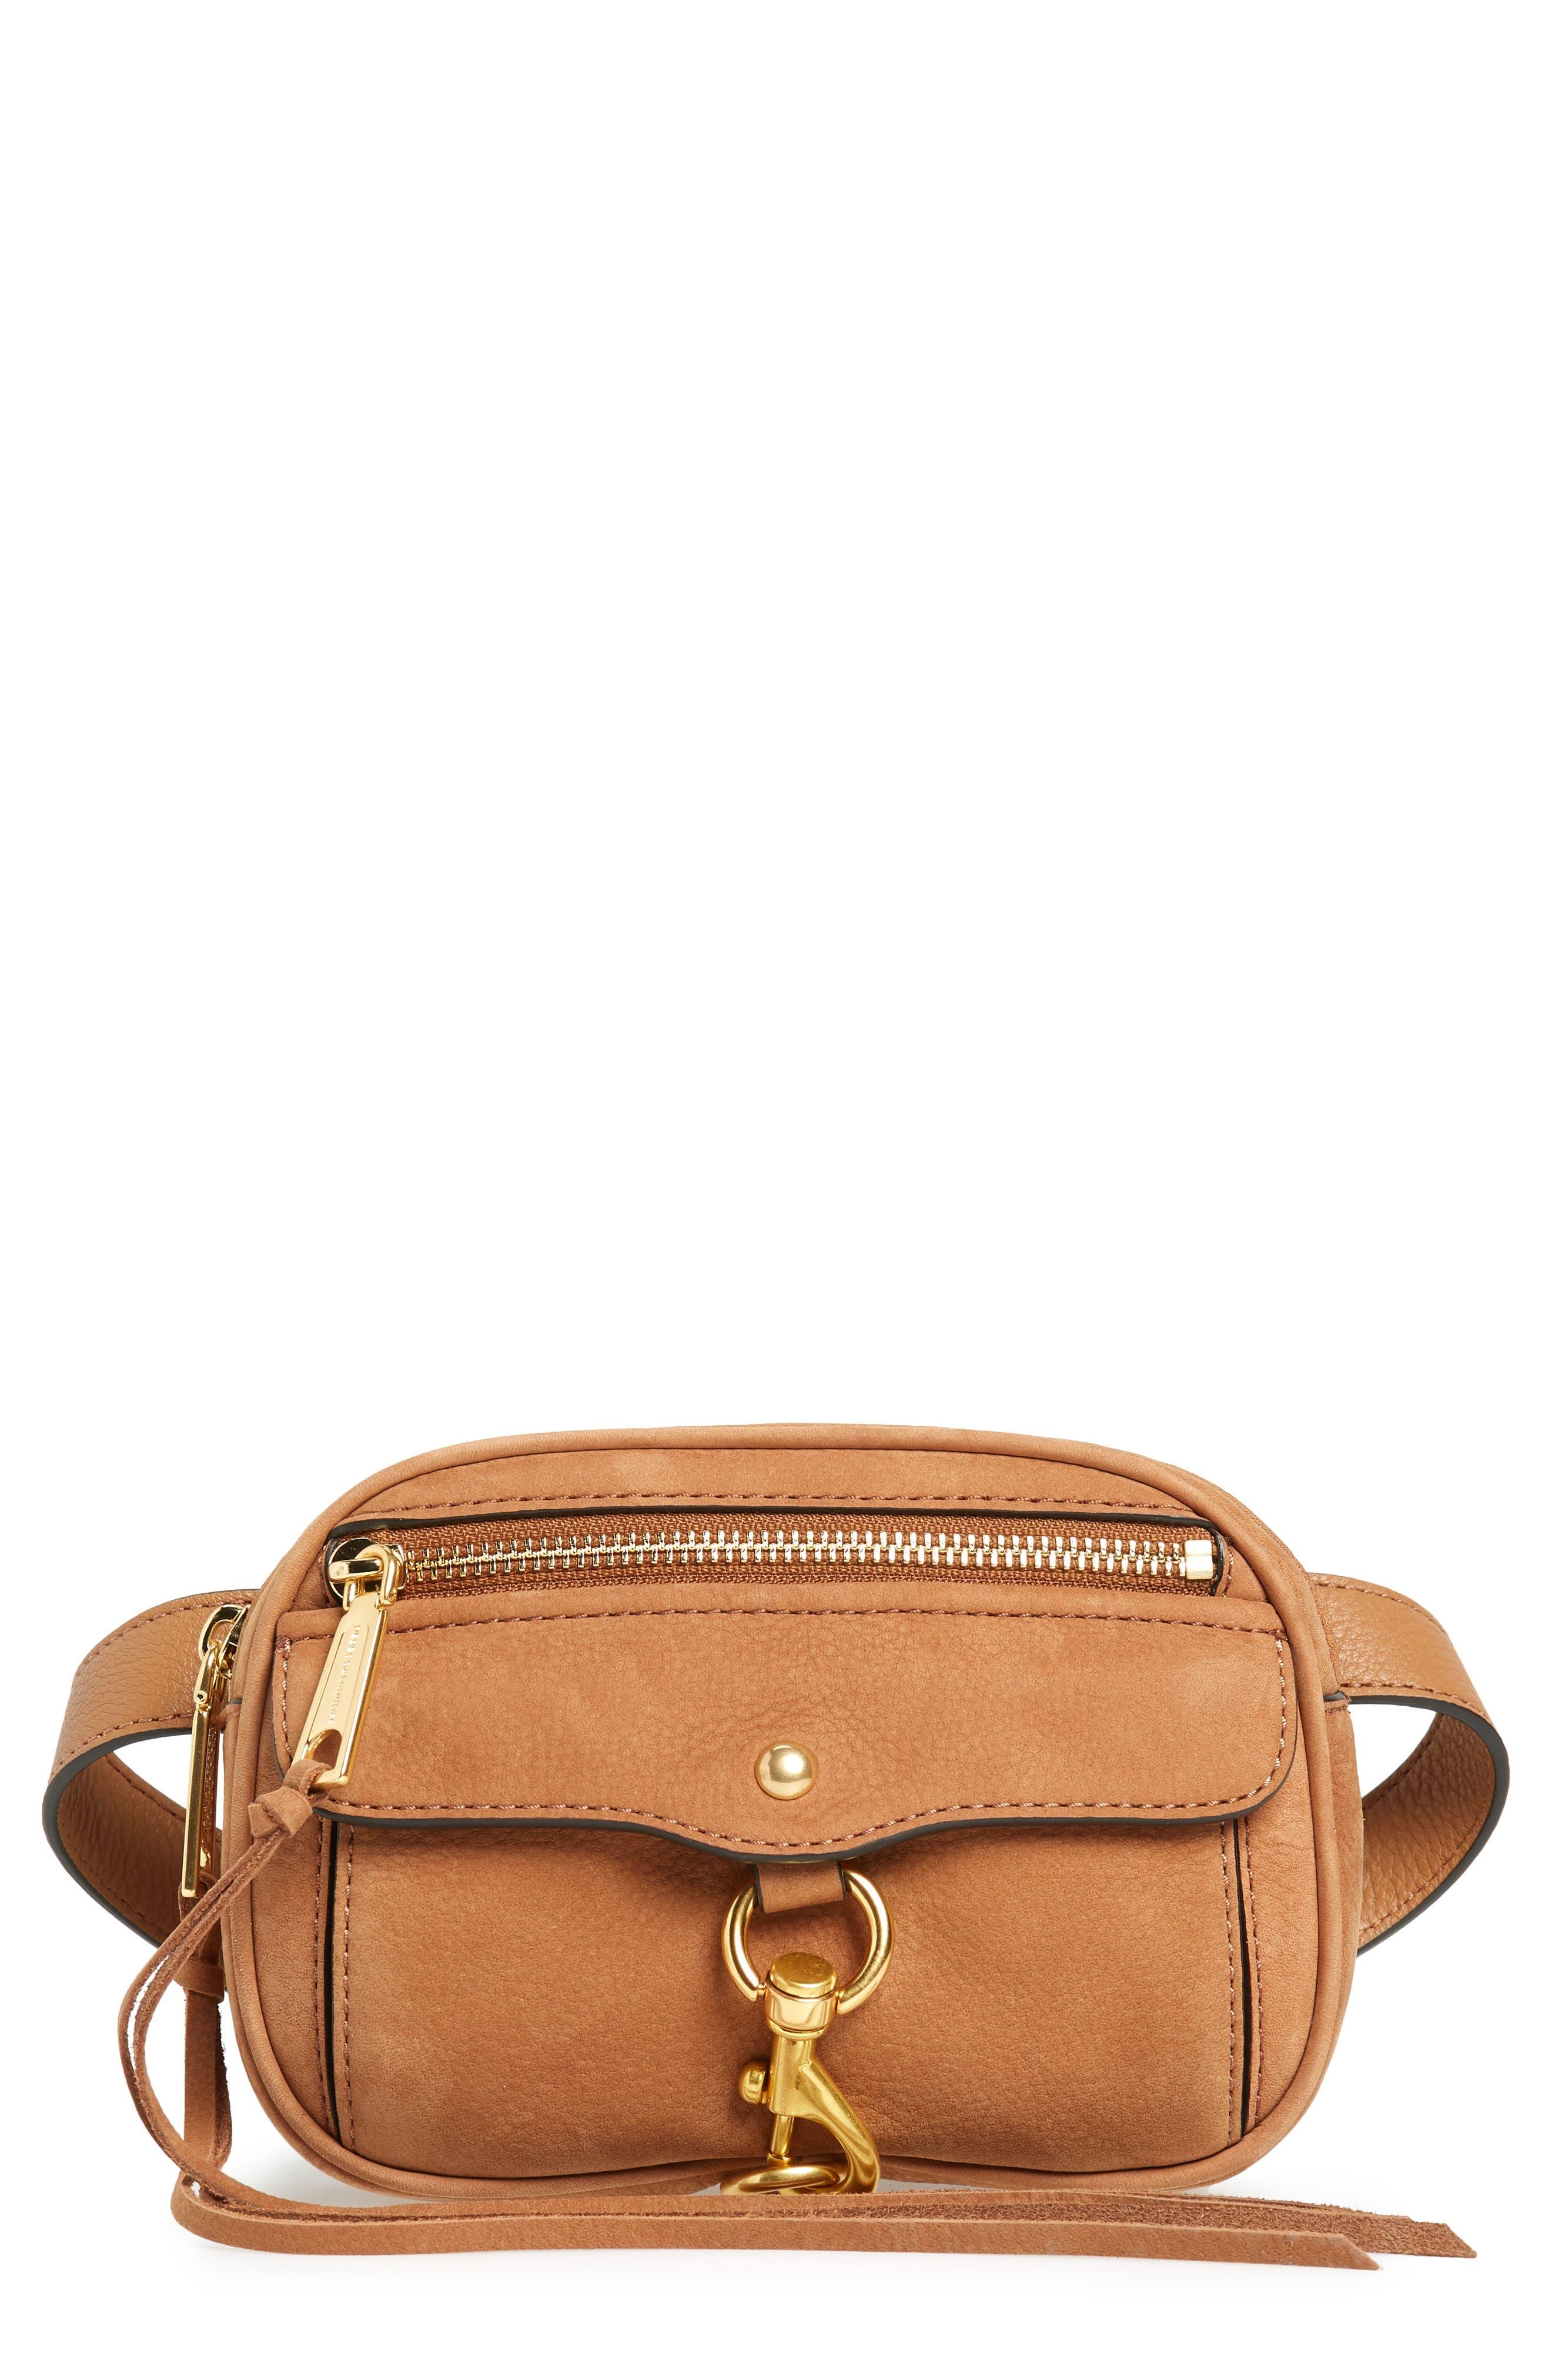 Blythe Leather Belt Bag,                             Main thumbnail 1, color,                             Almond